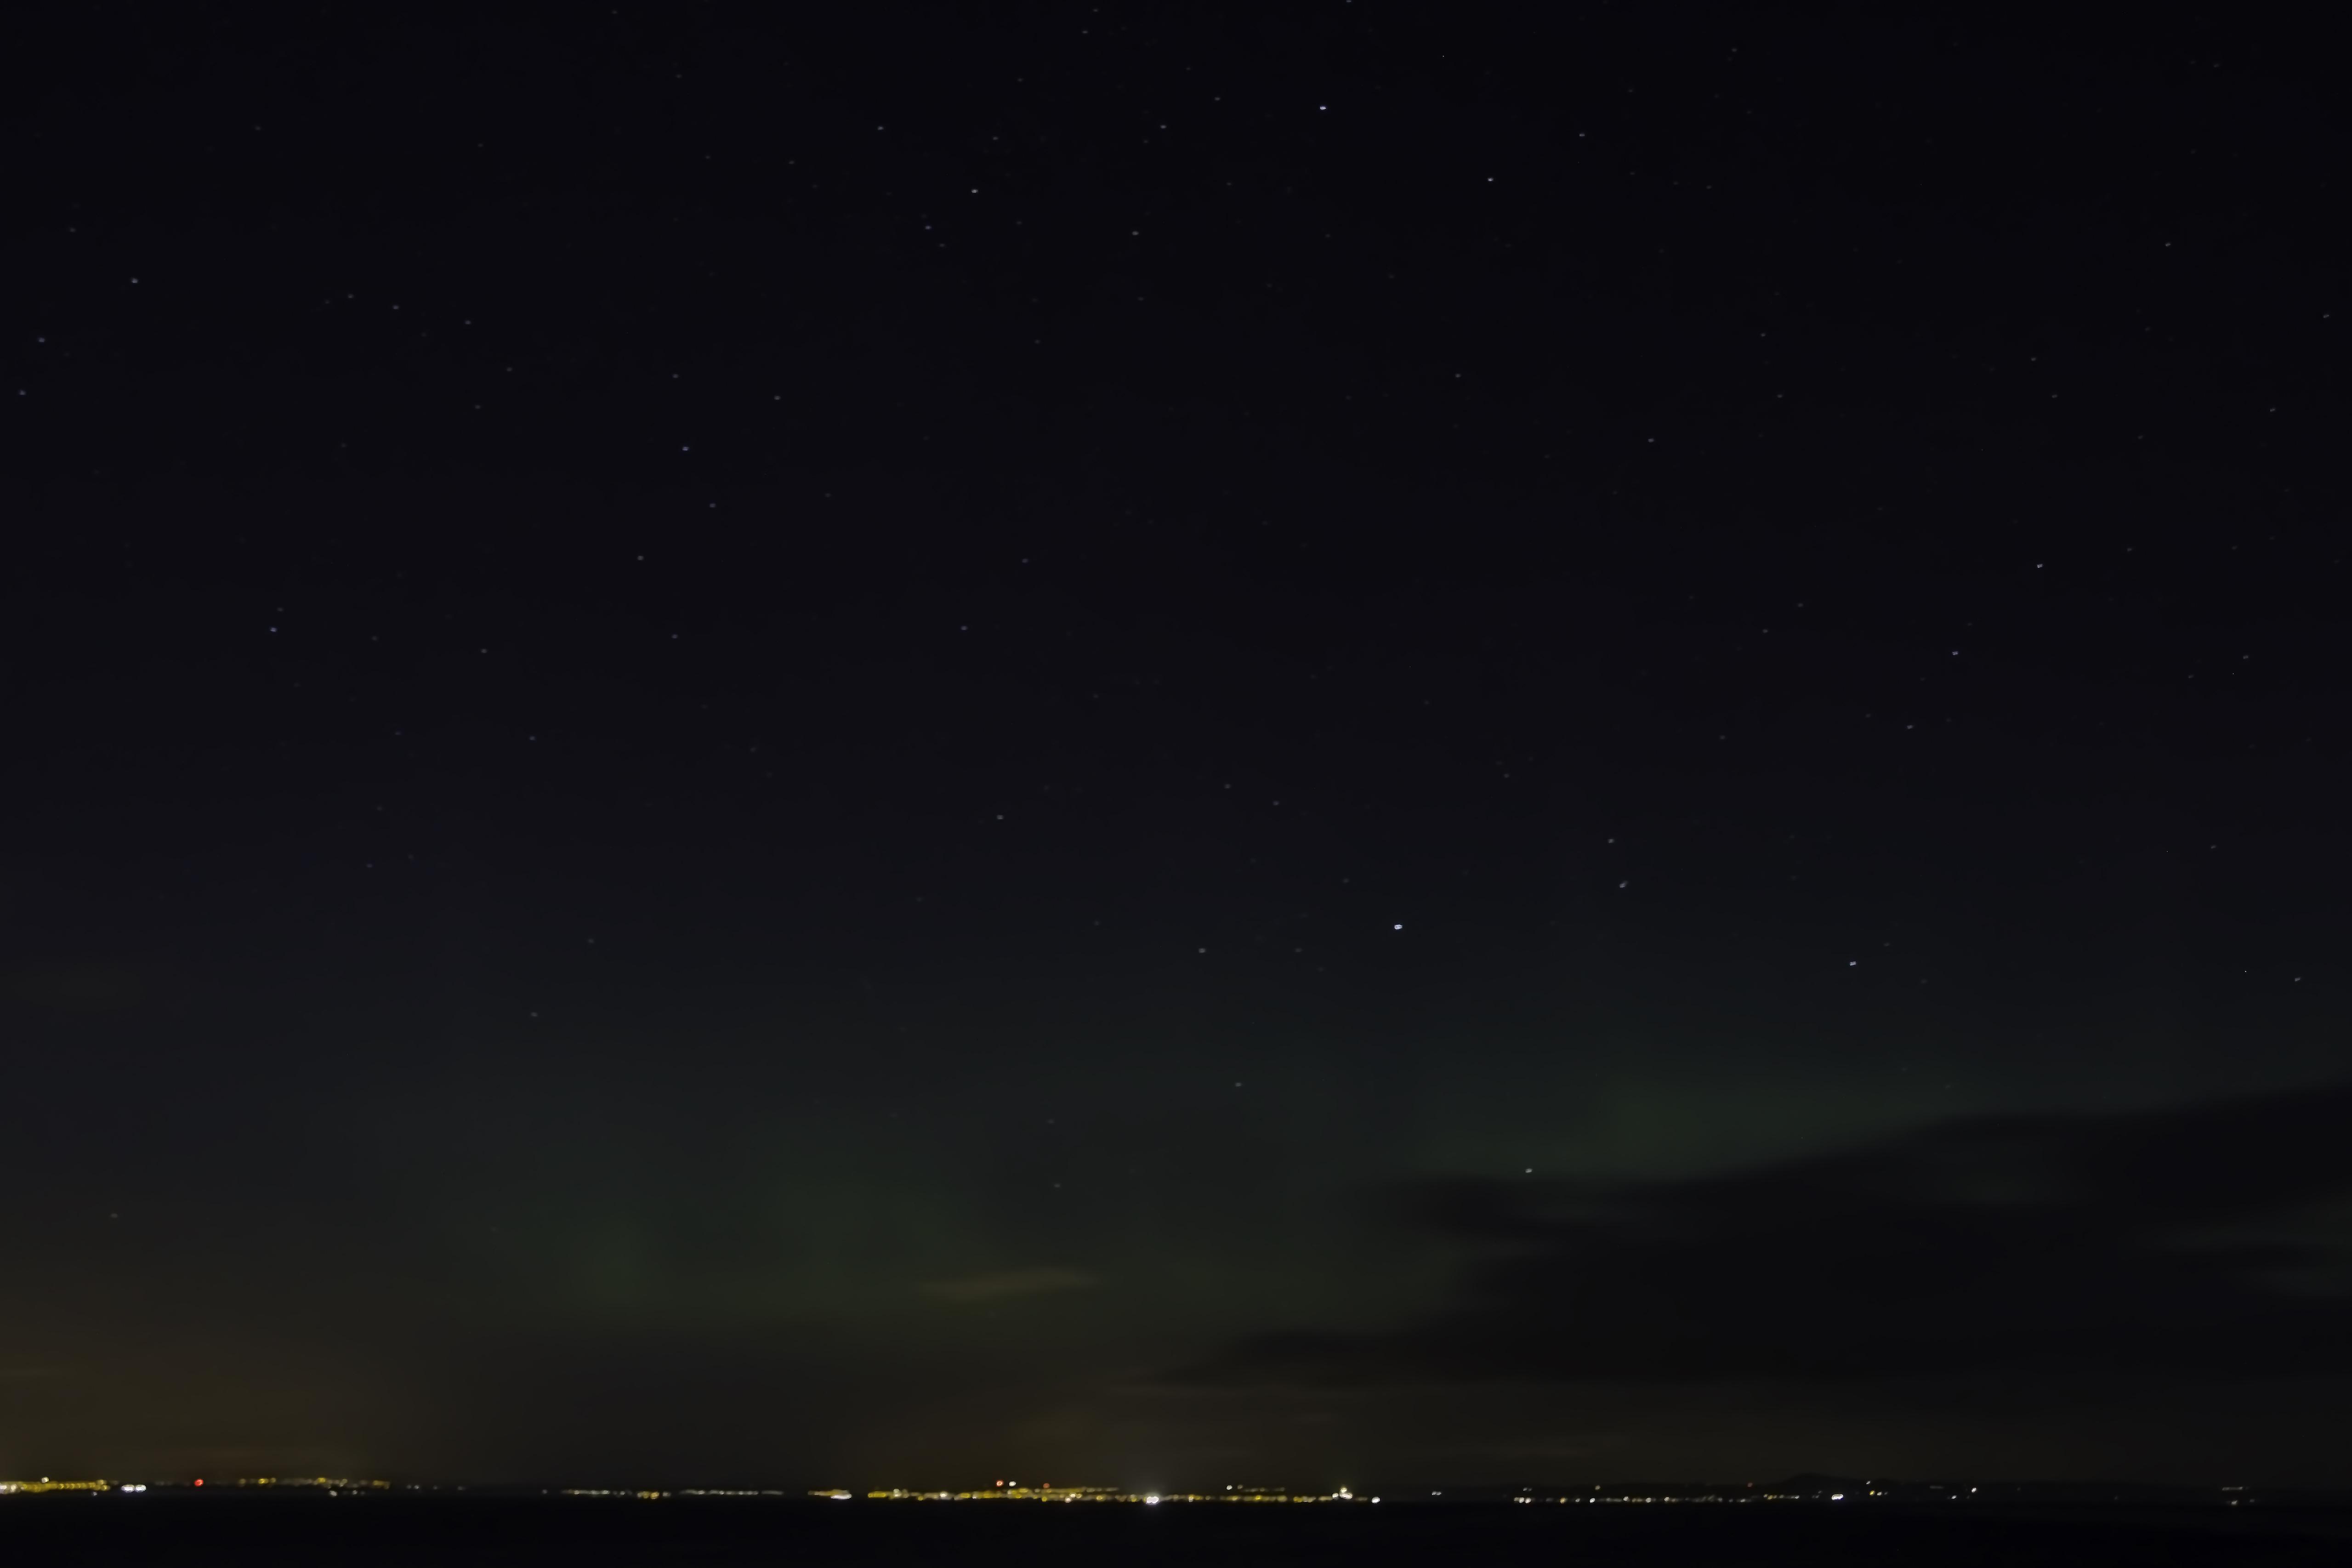 Aurora Borealis over Fife